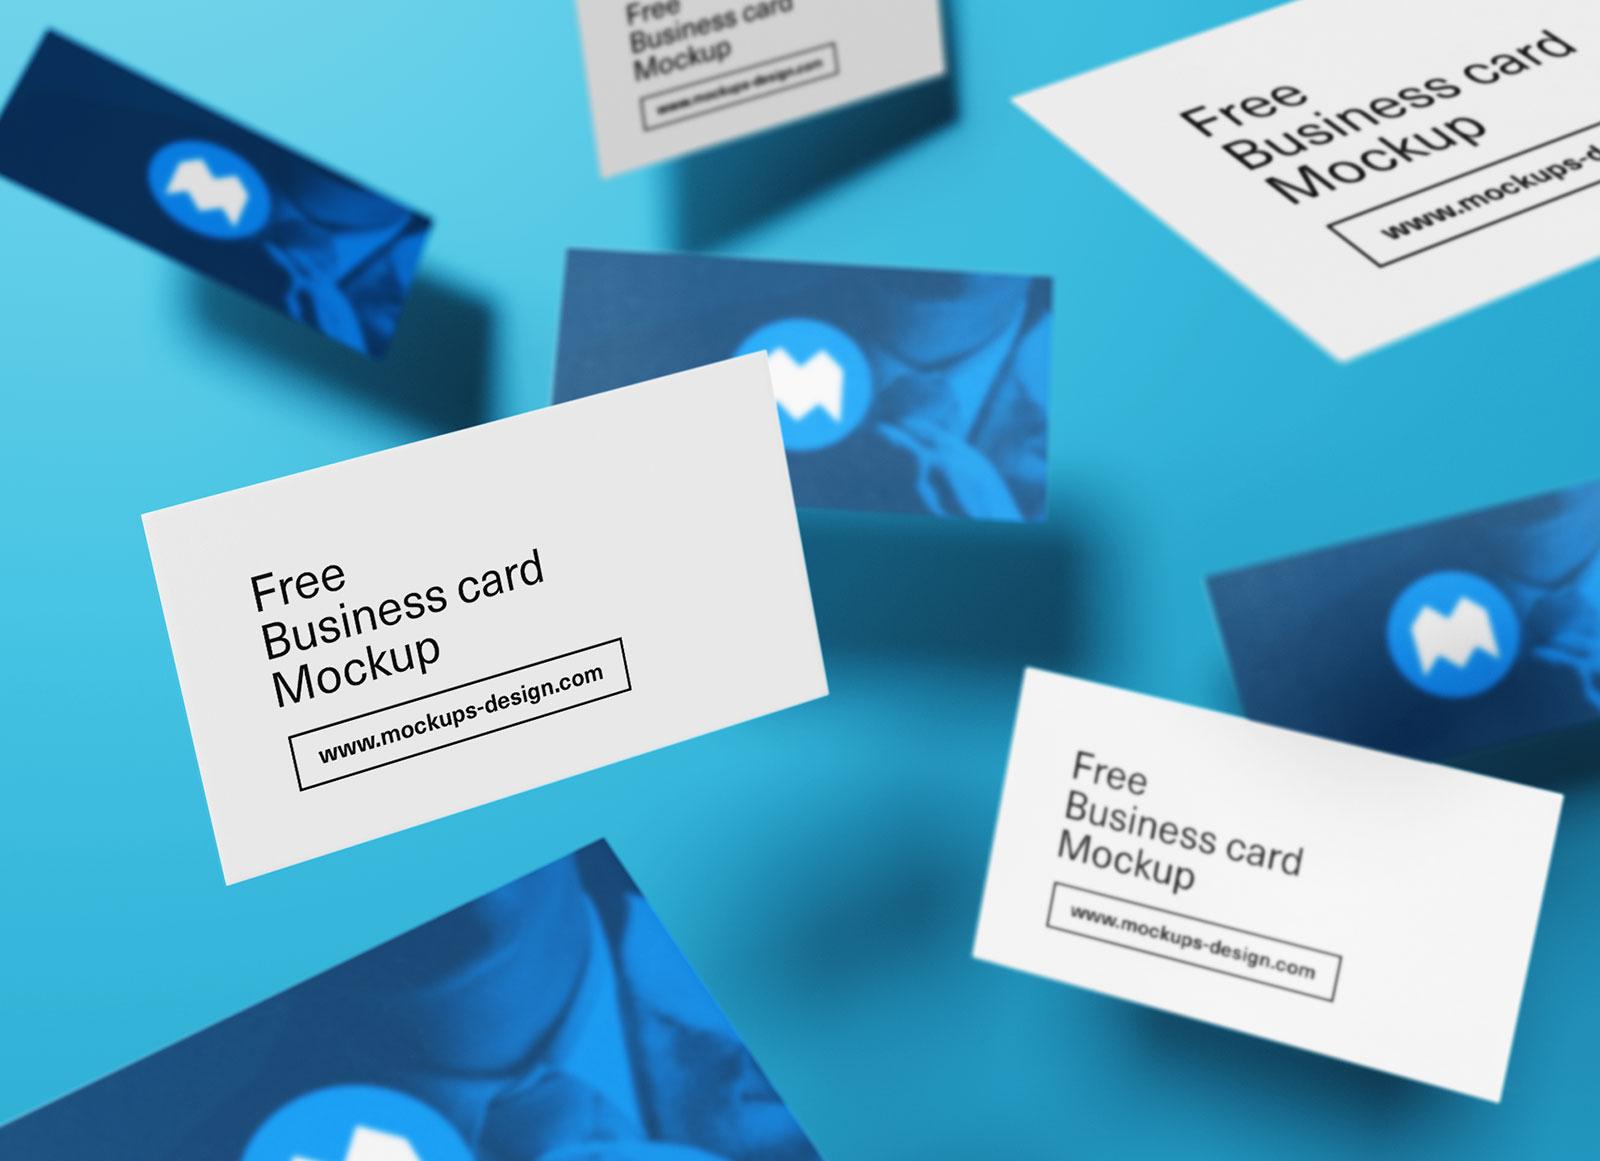 Free-Flying-Business-Card-Presentation-Mockup-PSD